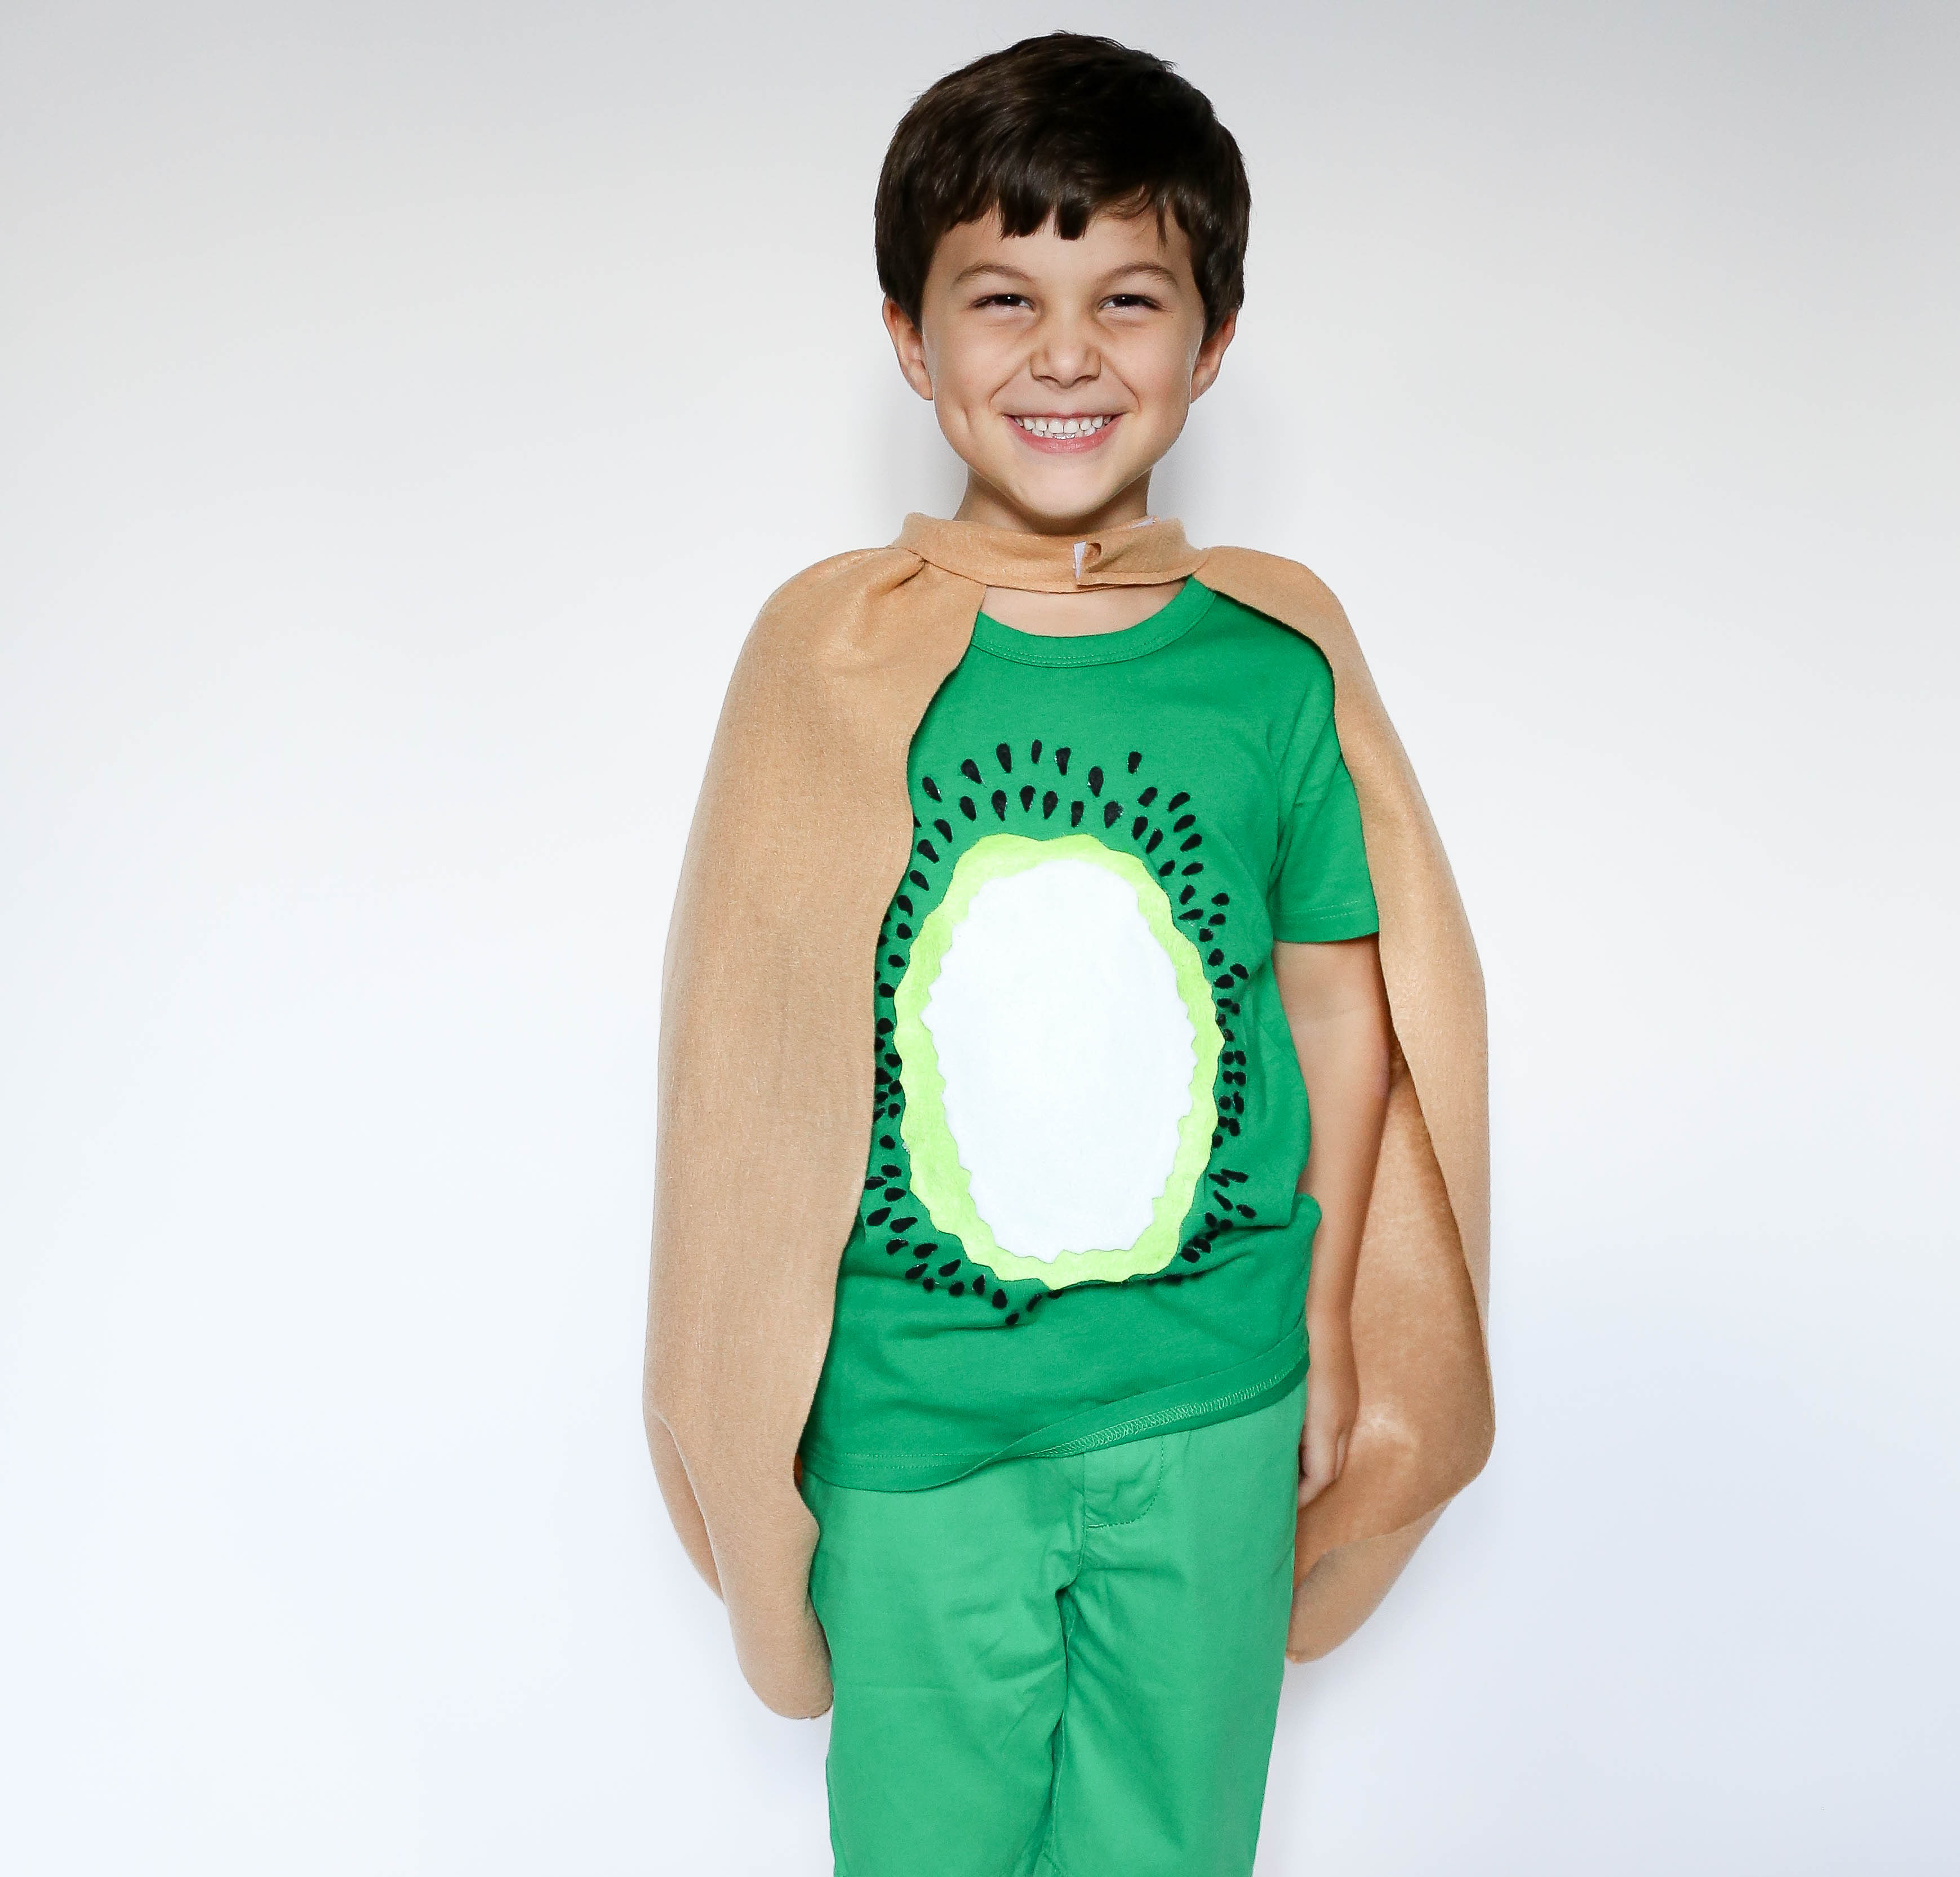 64d1a6b3db1384 No-Sew DIY Kiwi Kids Costume | Primary.com